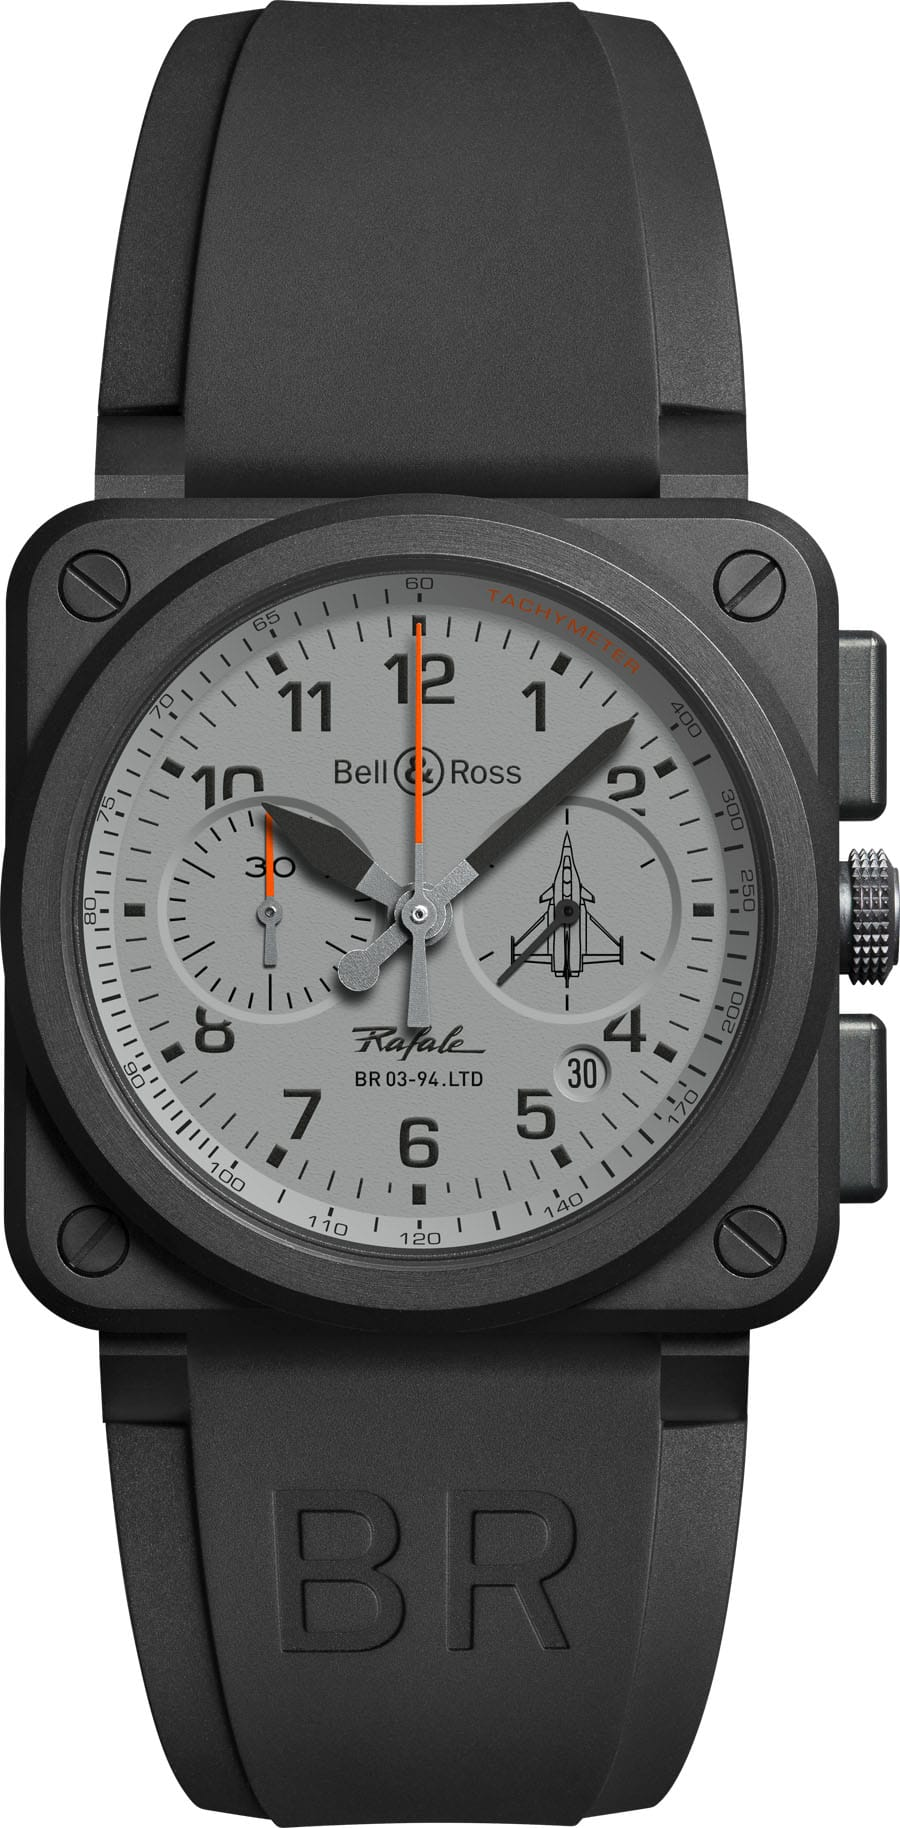 Auf 500 Exemplare limitiert: Bell & Ross: Chronograph BR 03-94 Rafale